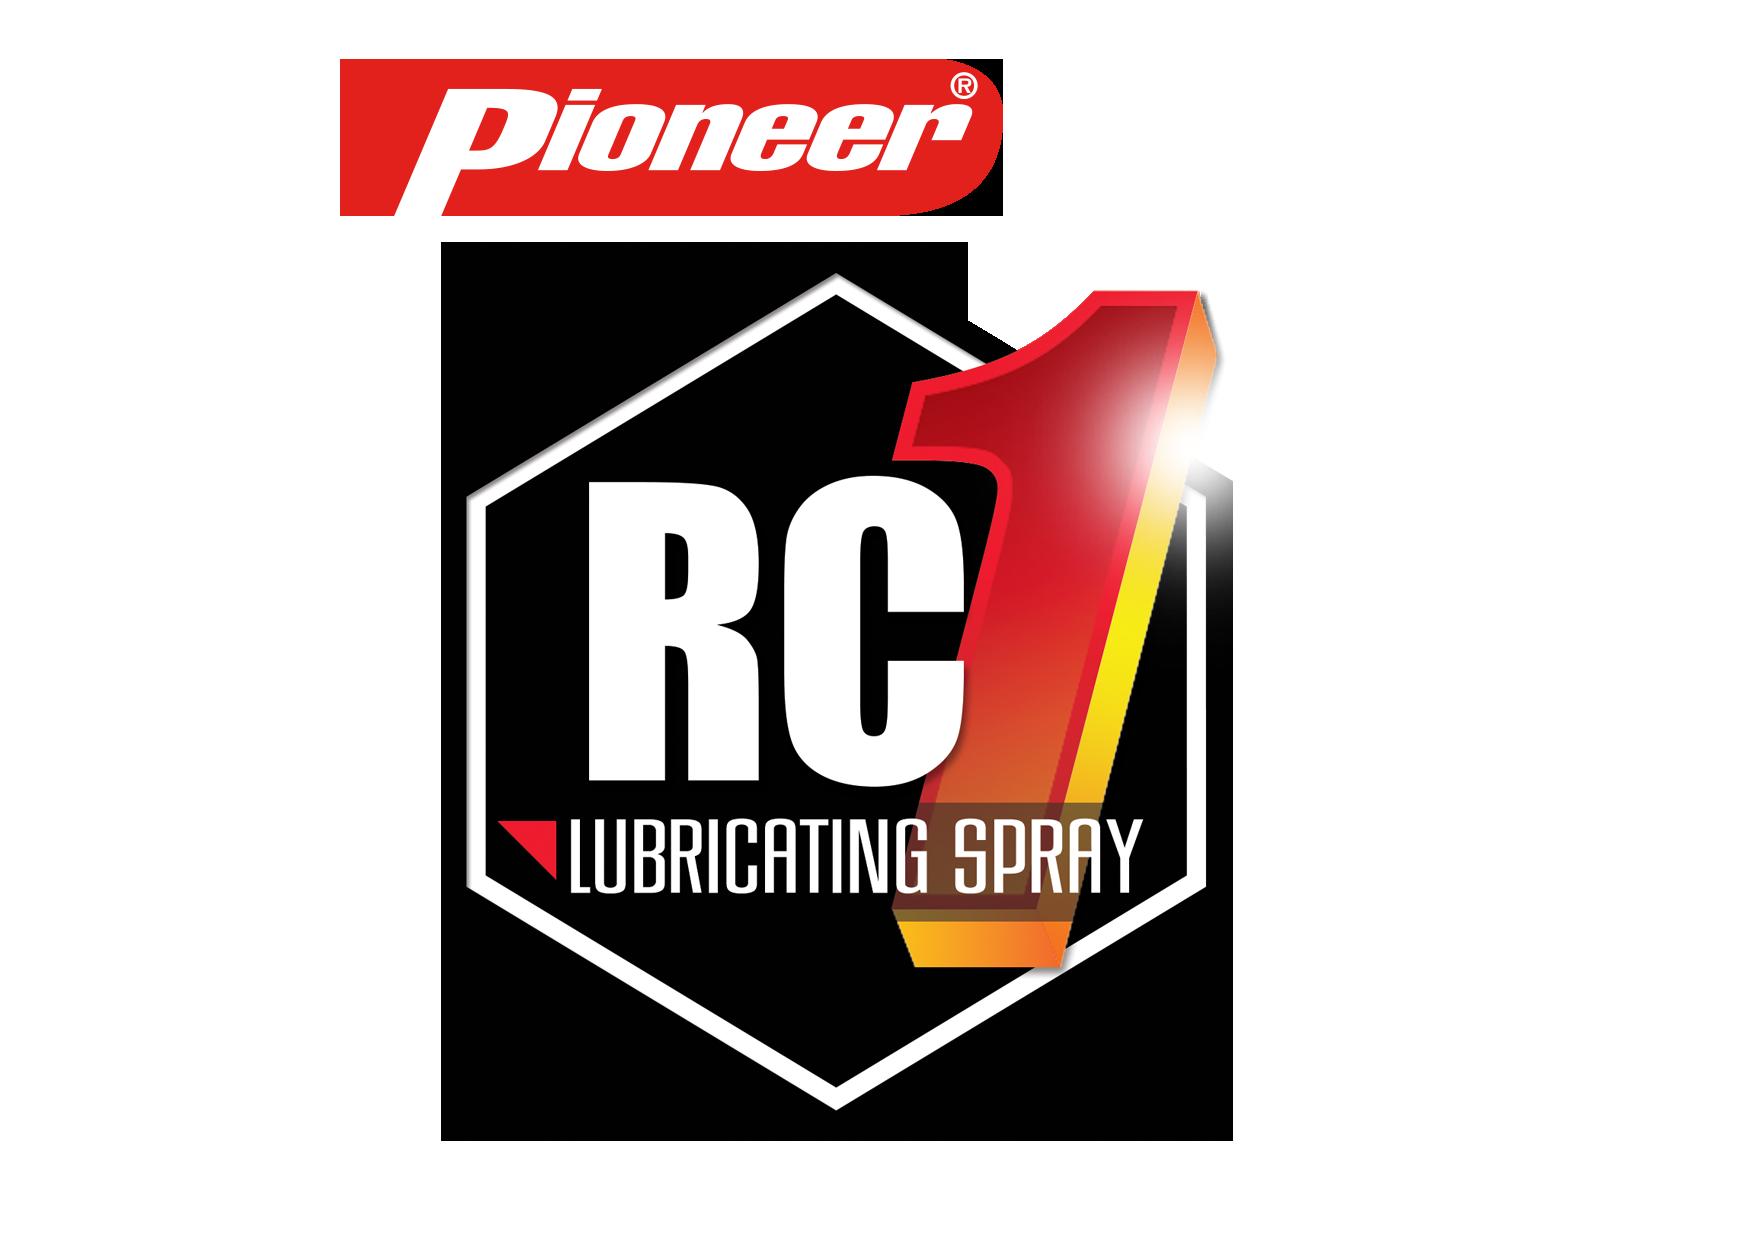 Pioneer RC1 Logo